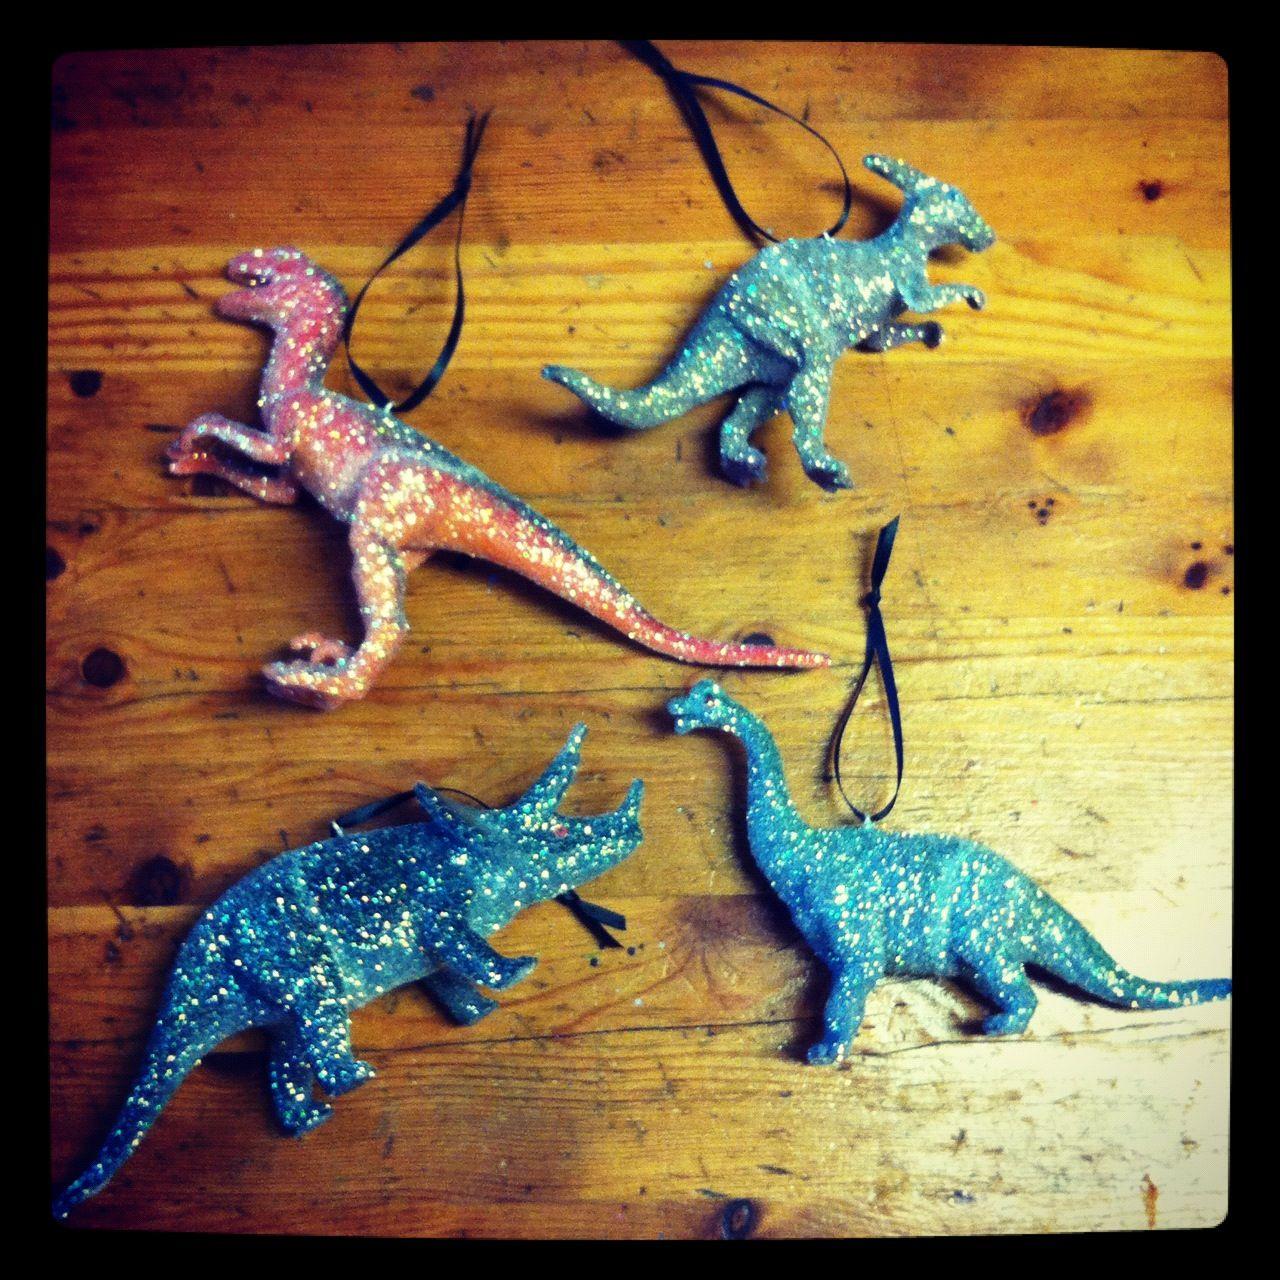 Dinosaur christmas ornaments - Glitter Dinosaur Christmas Decorations